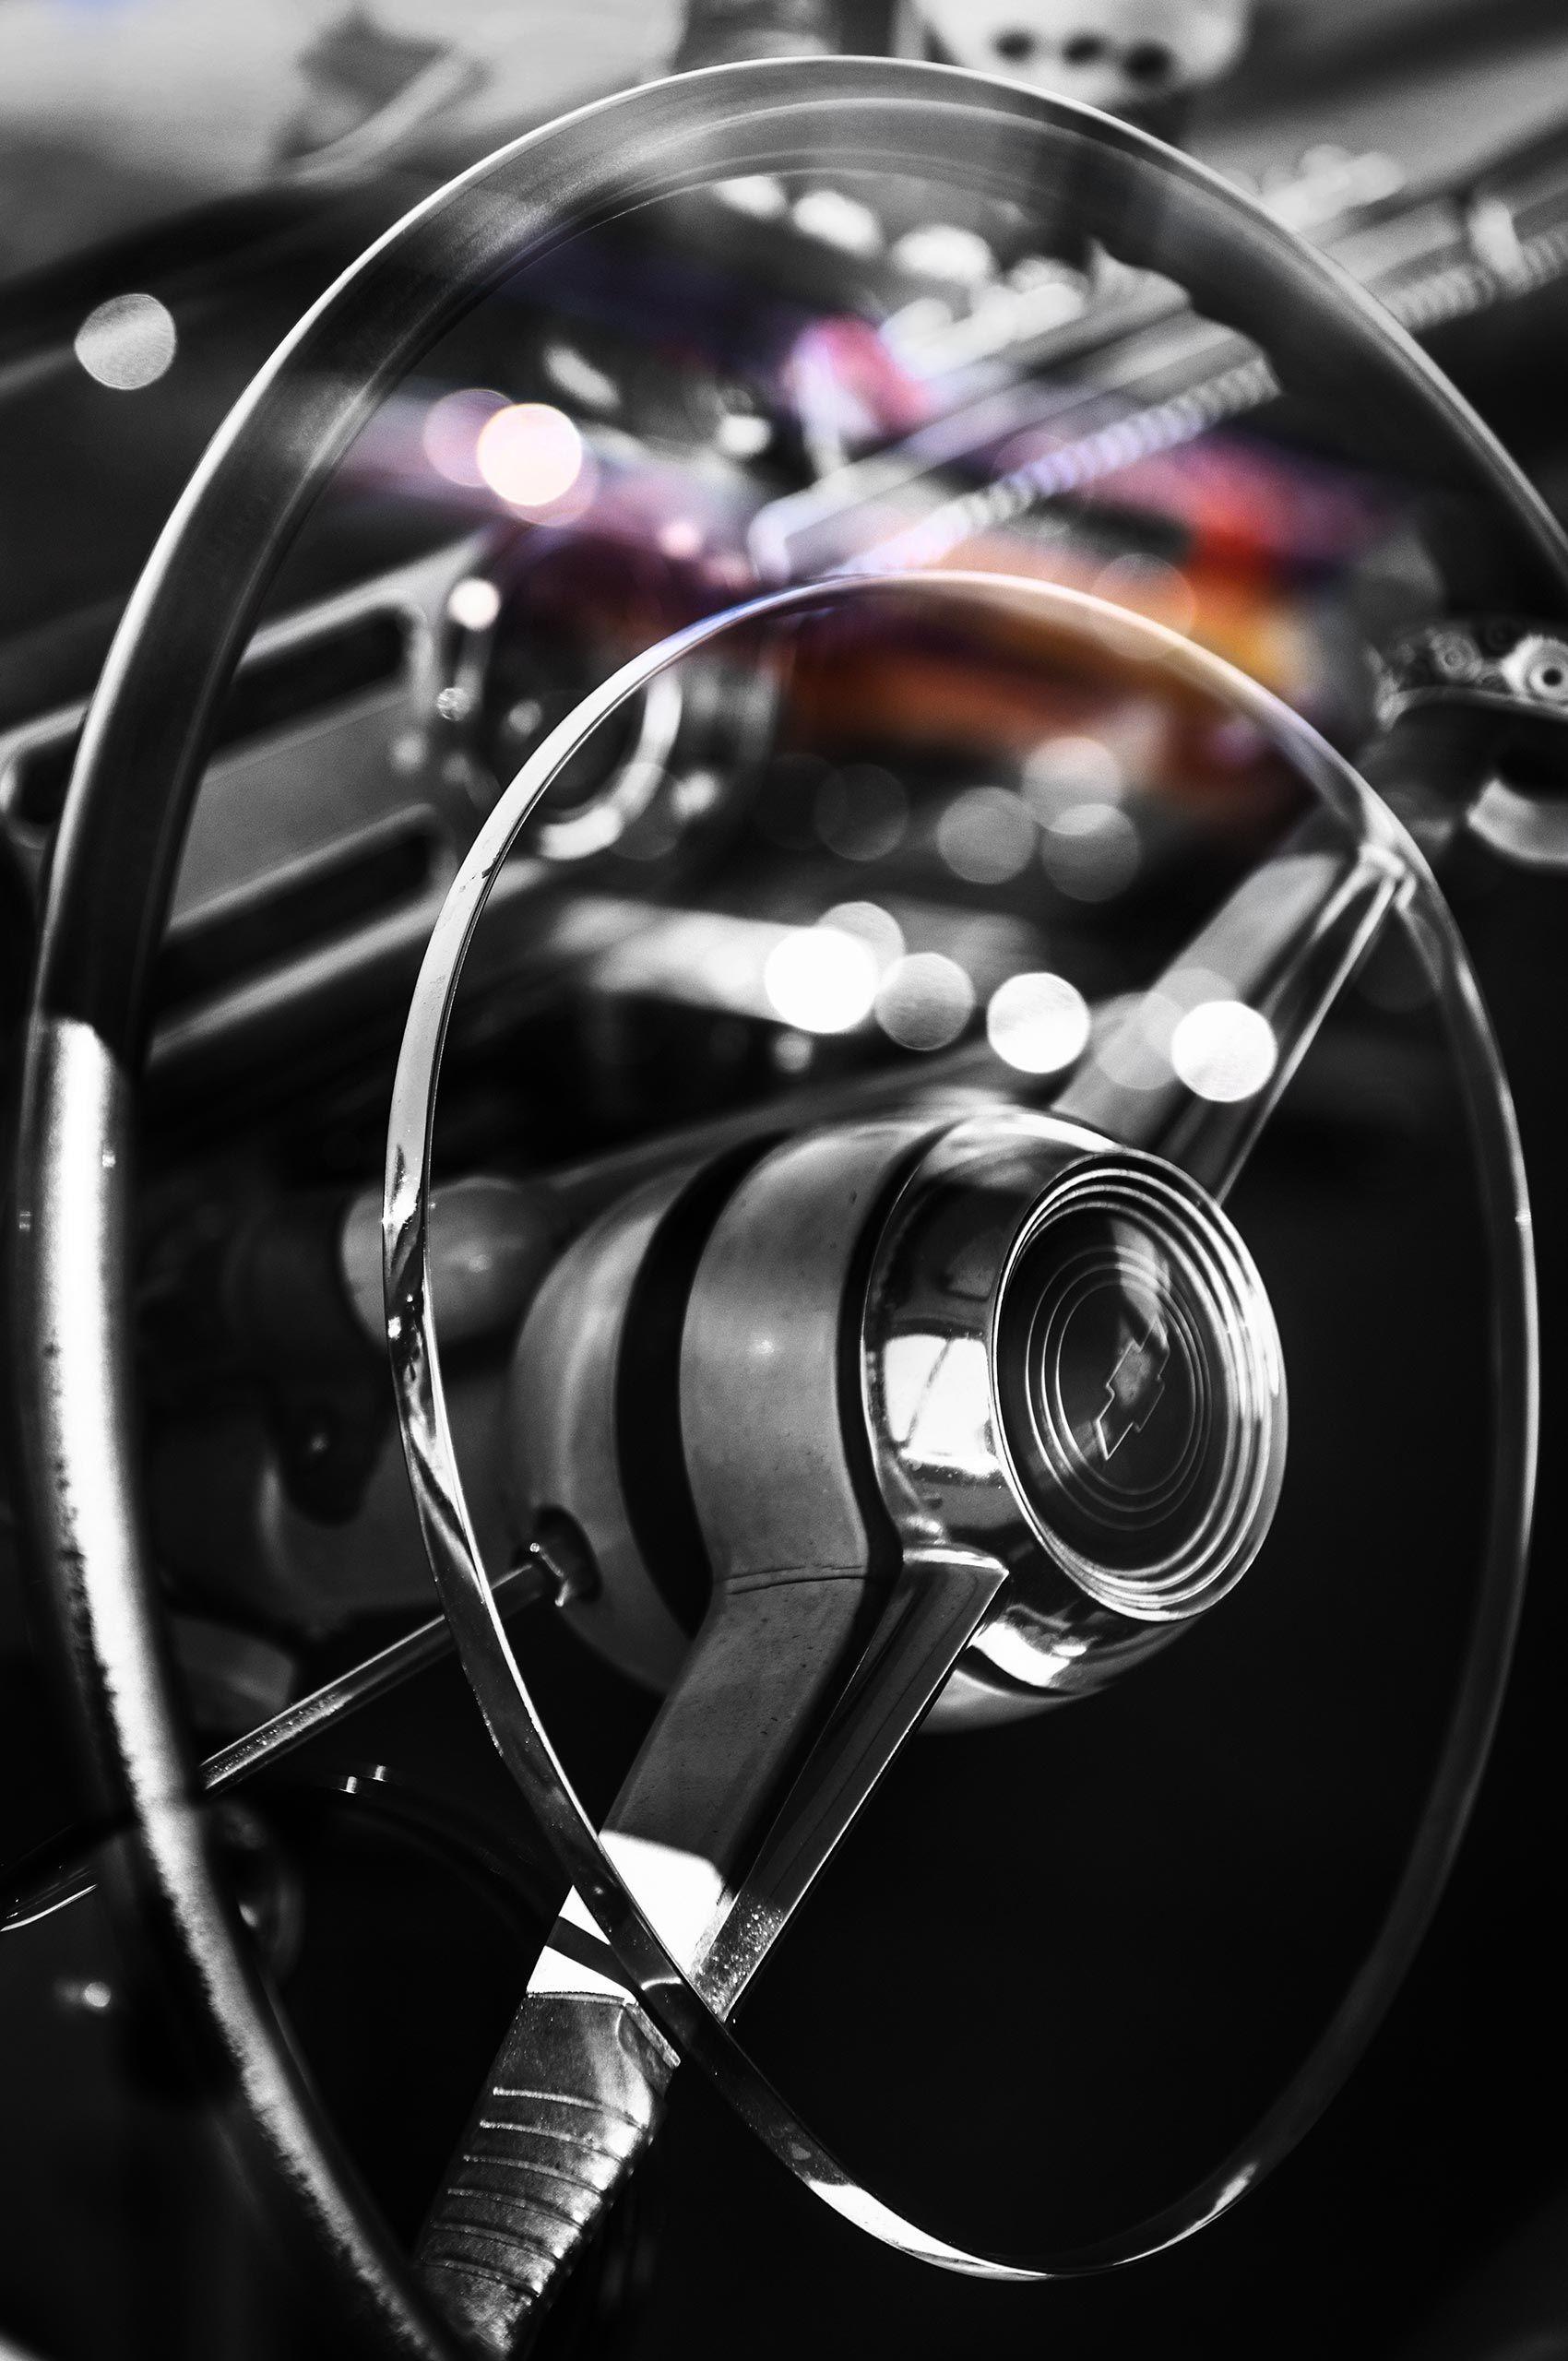 classic-car-wheel-vivalasvegas-HenrikOlundPhotography.jpg